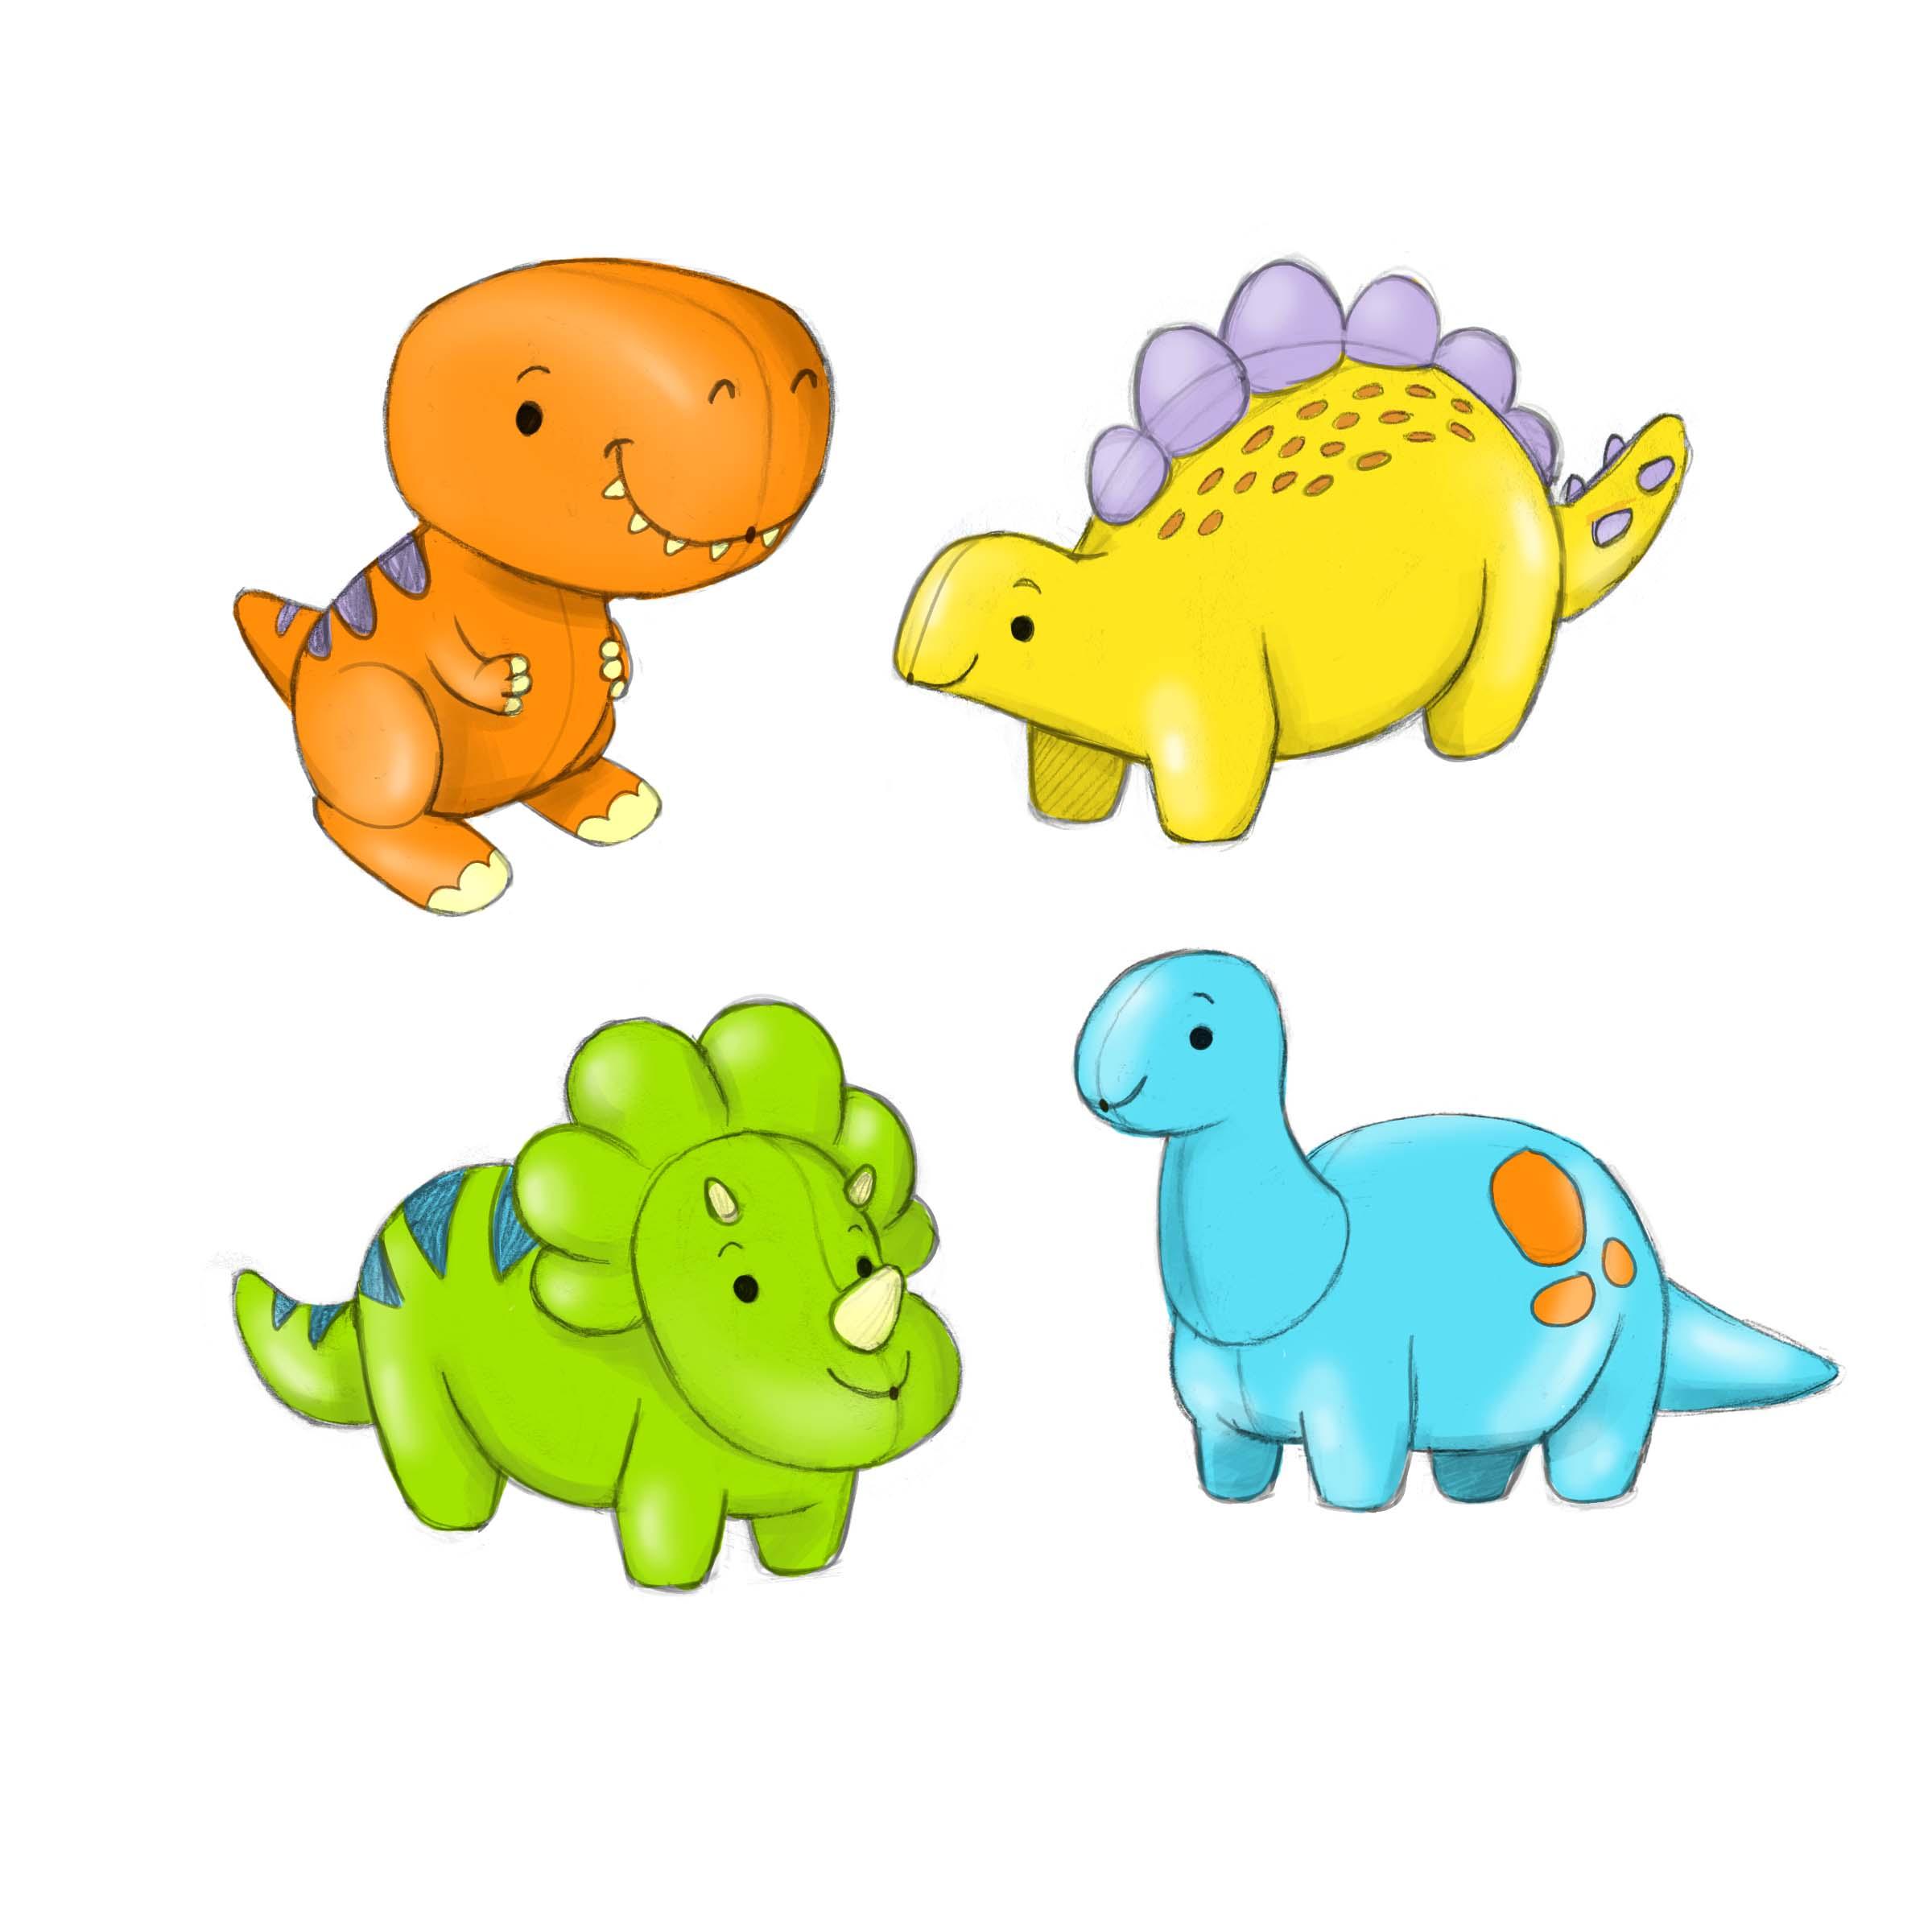 DinosaurBathToys_mdemmer.jpg